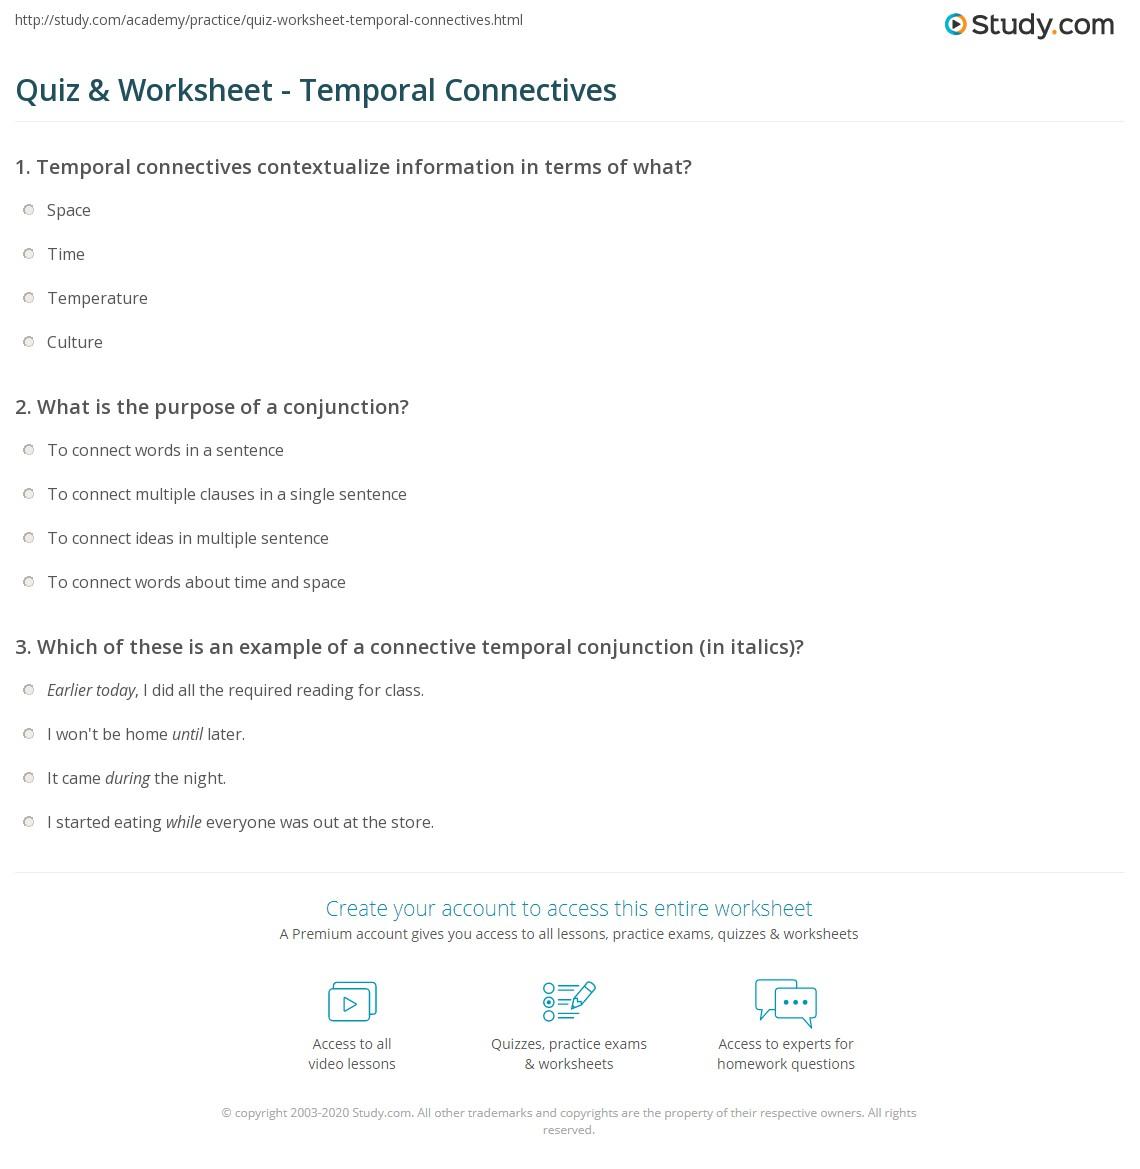 hight resolution of Quiz \u0026 Worksheet - Temporal Connectives   Study.com